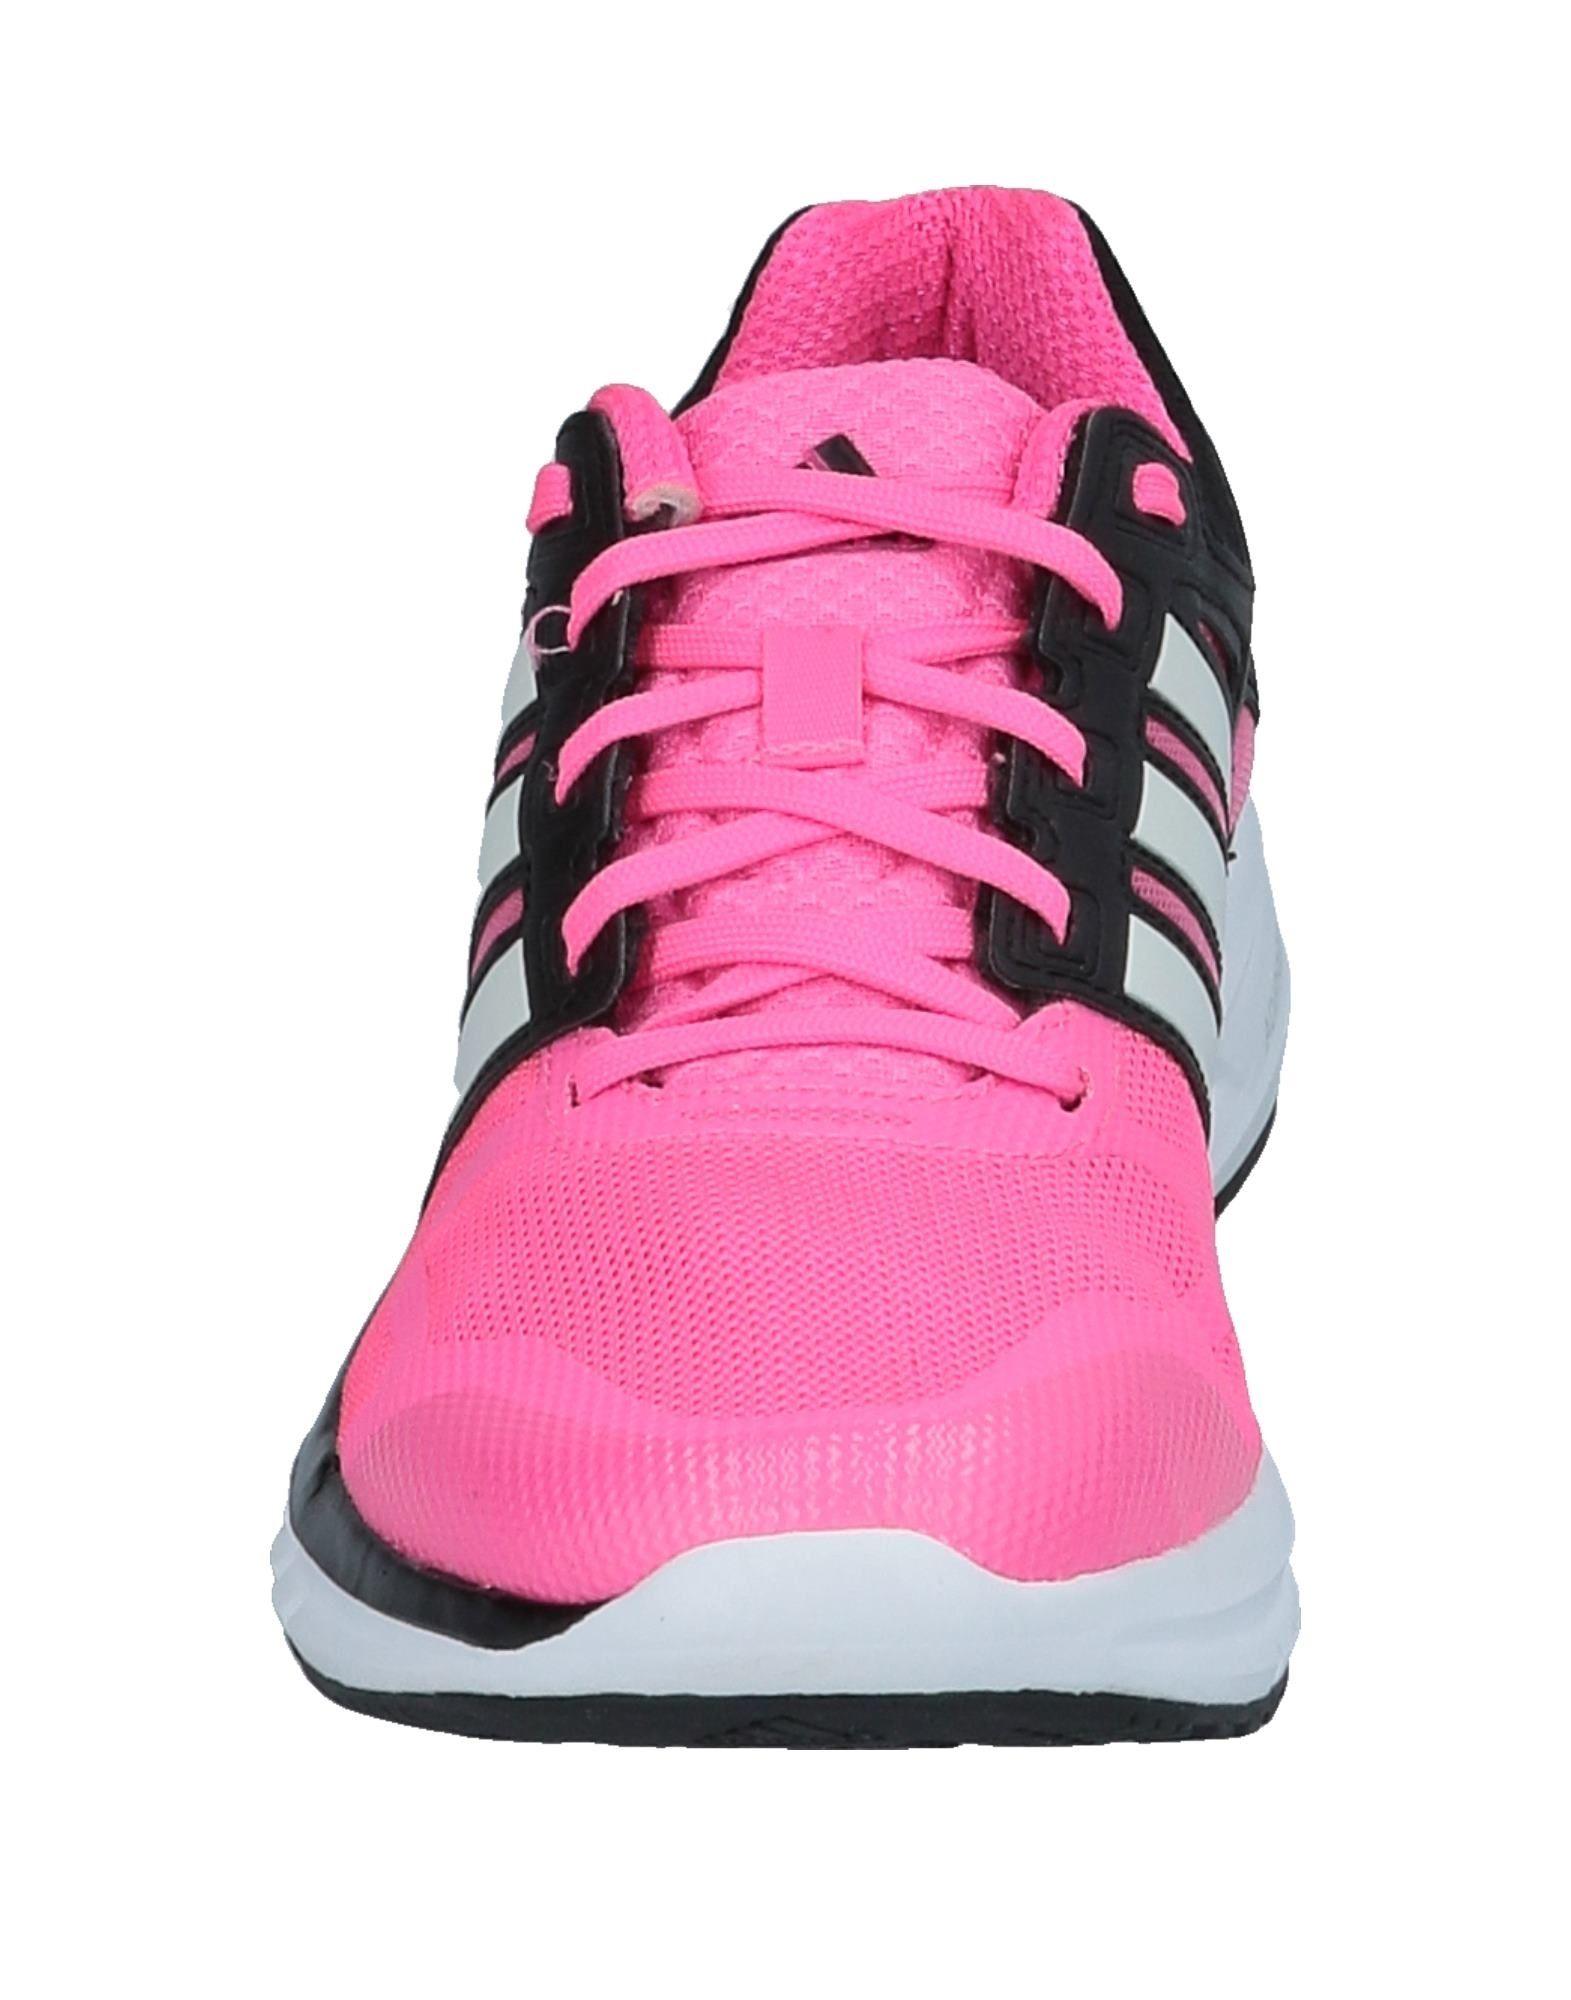 Adidas Sneakers Damen   Damen 11538477KO  953b2a